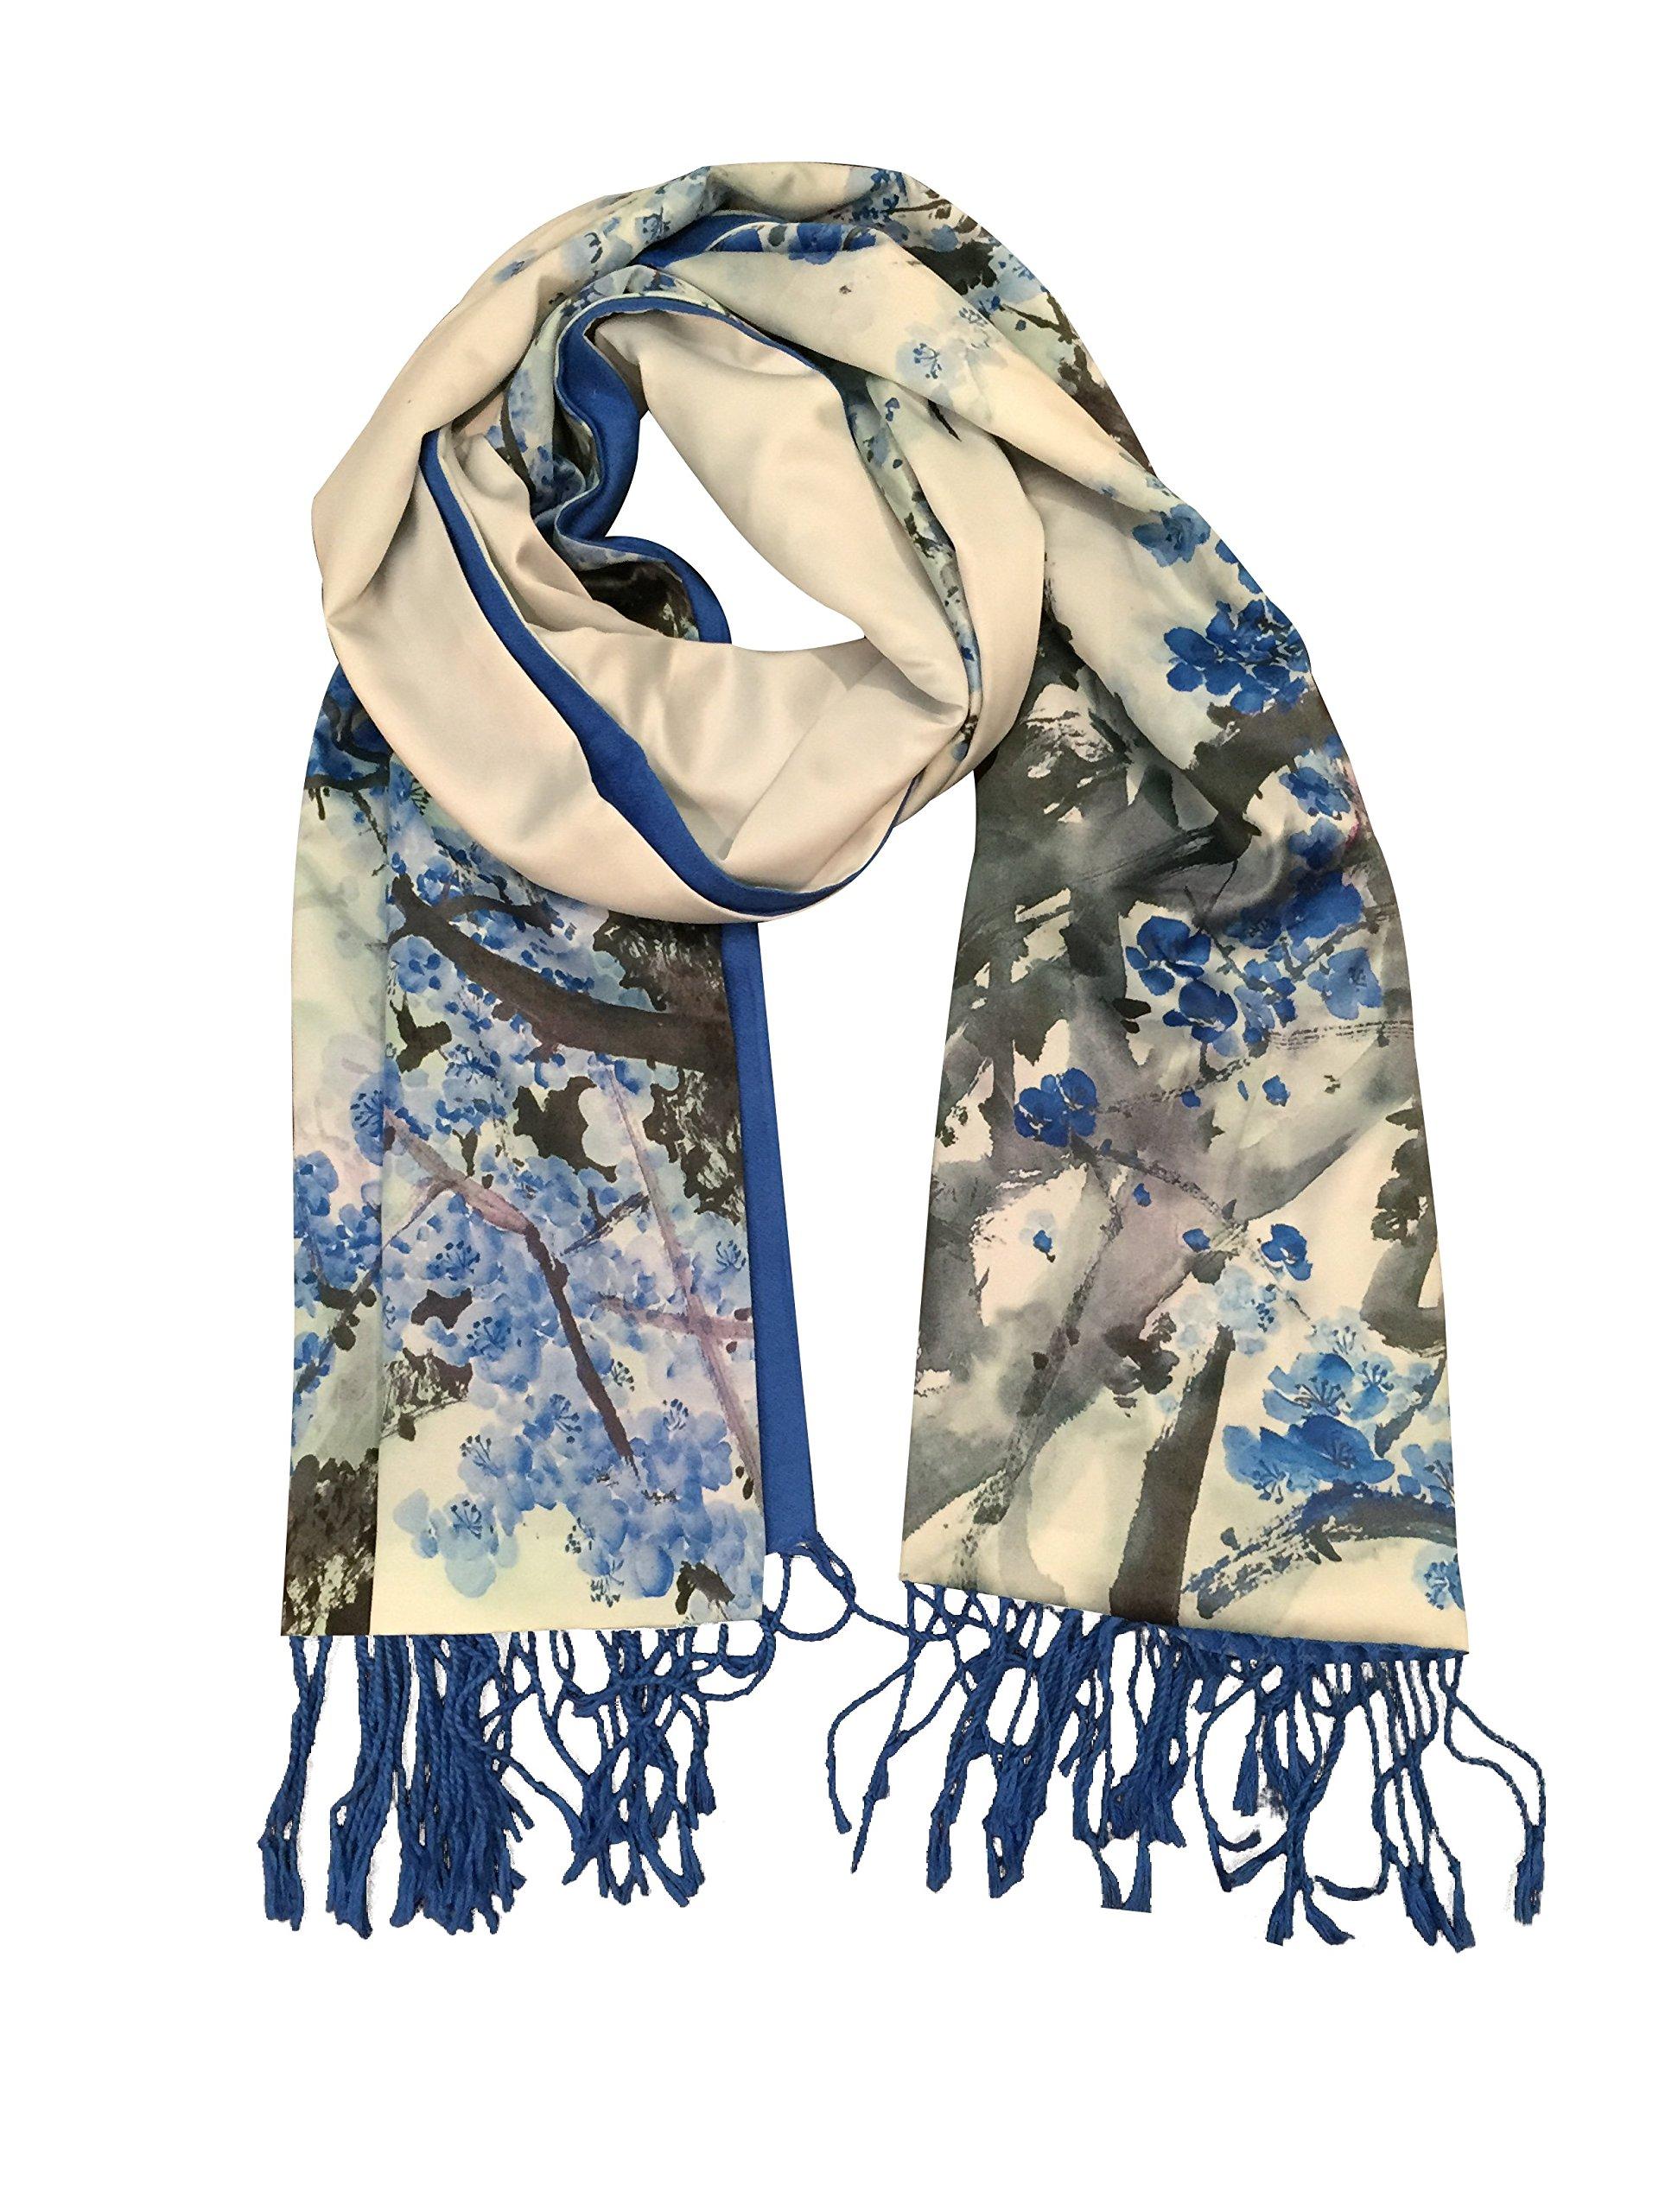 Siskalicious SiScarf Women's Luxurious Fashions Double Layers Silk and Soft Cashmere Scarf Blue Sakura